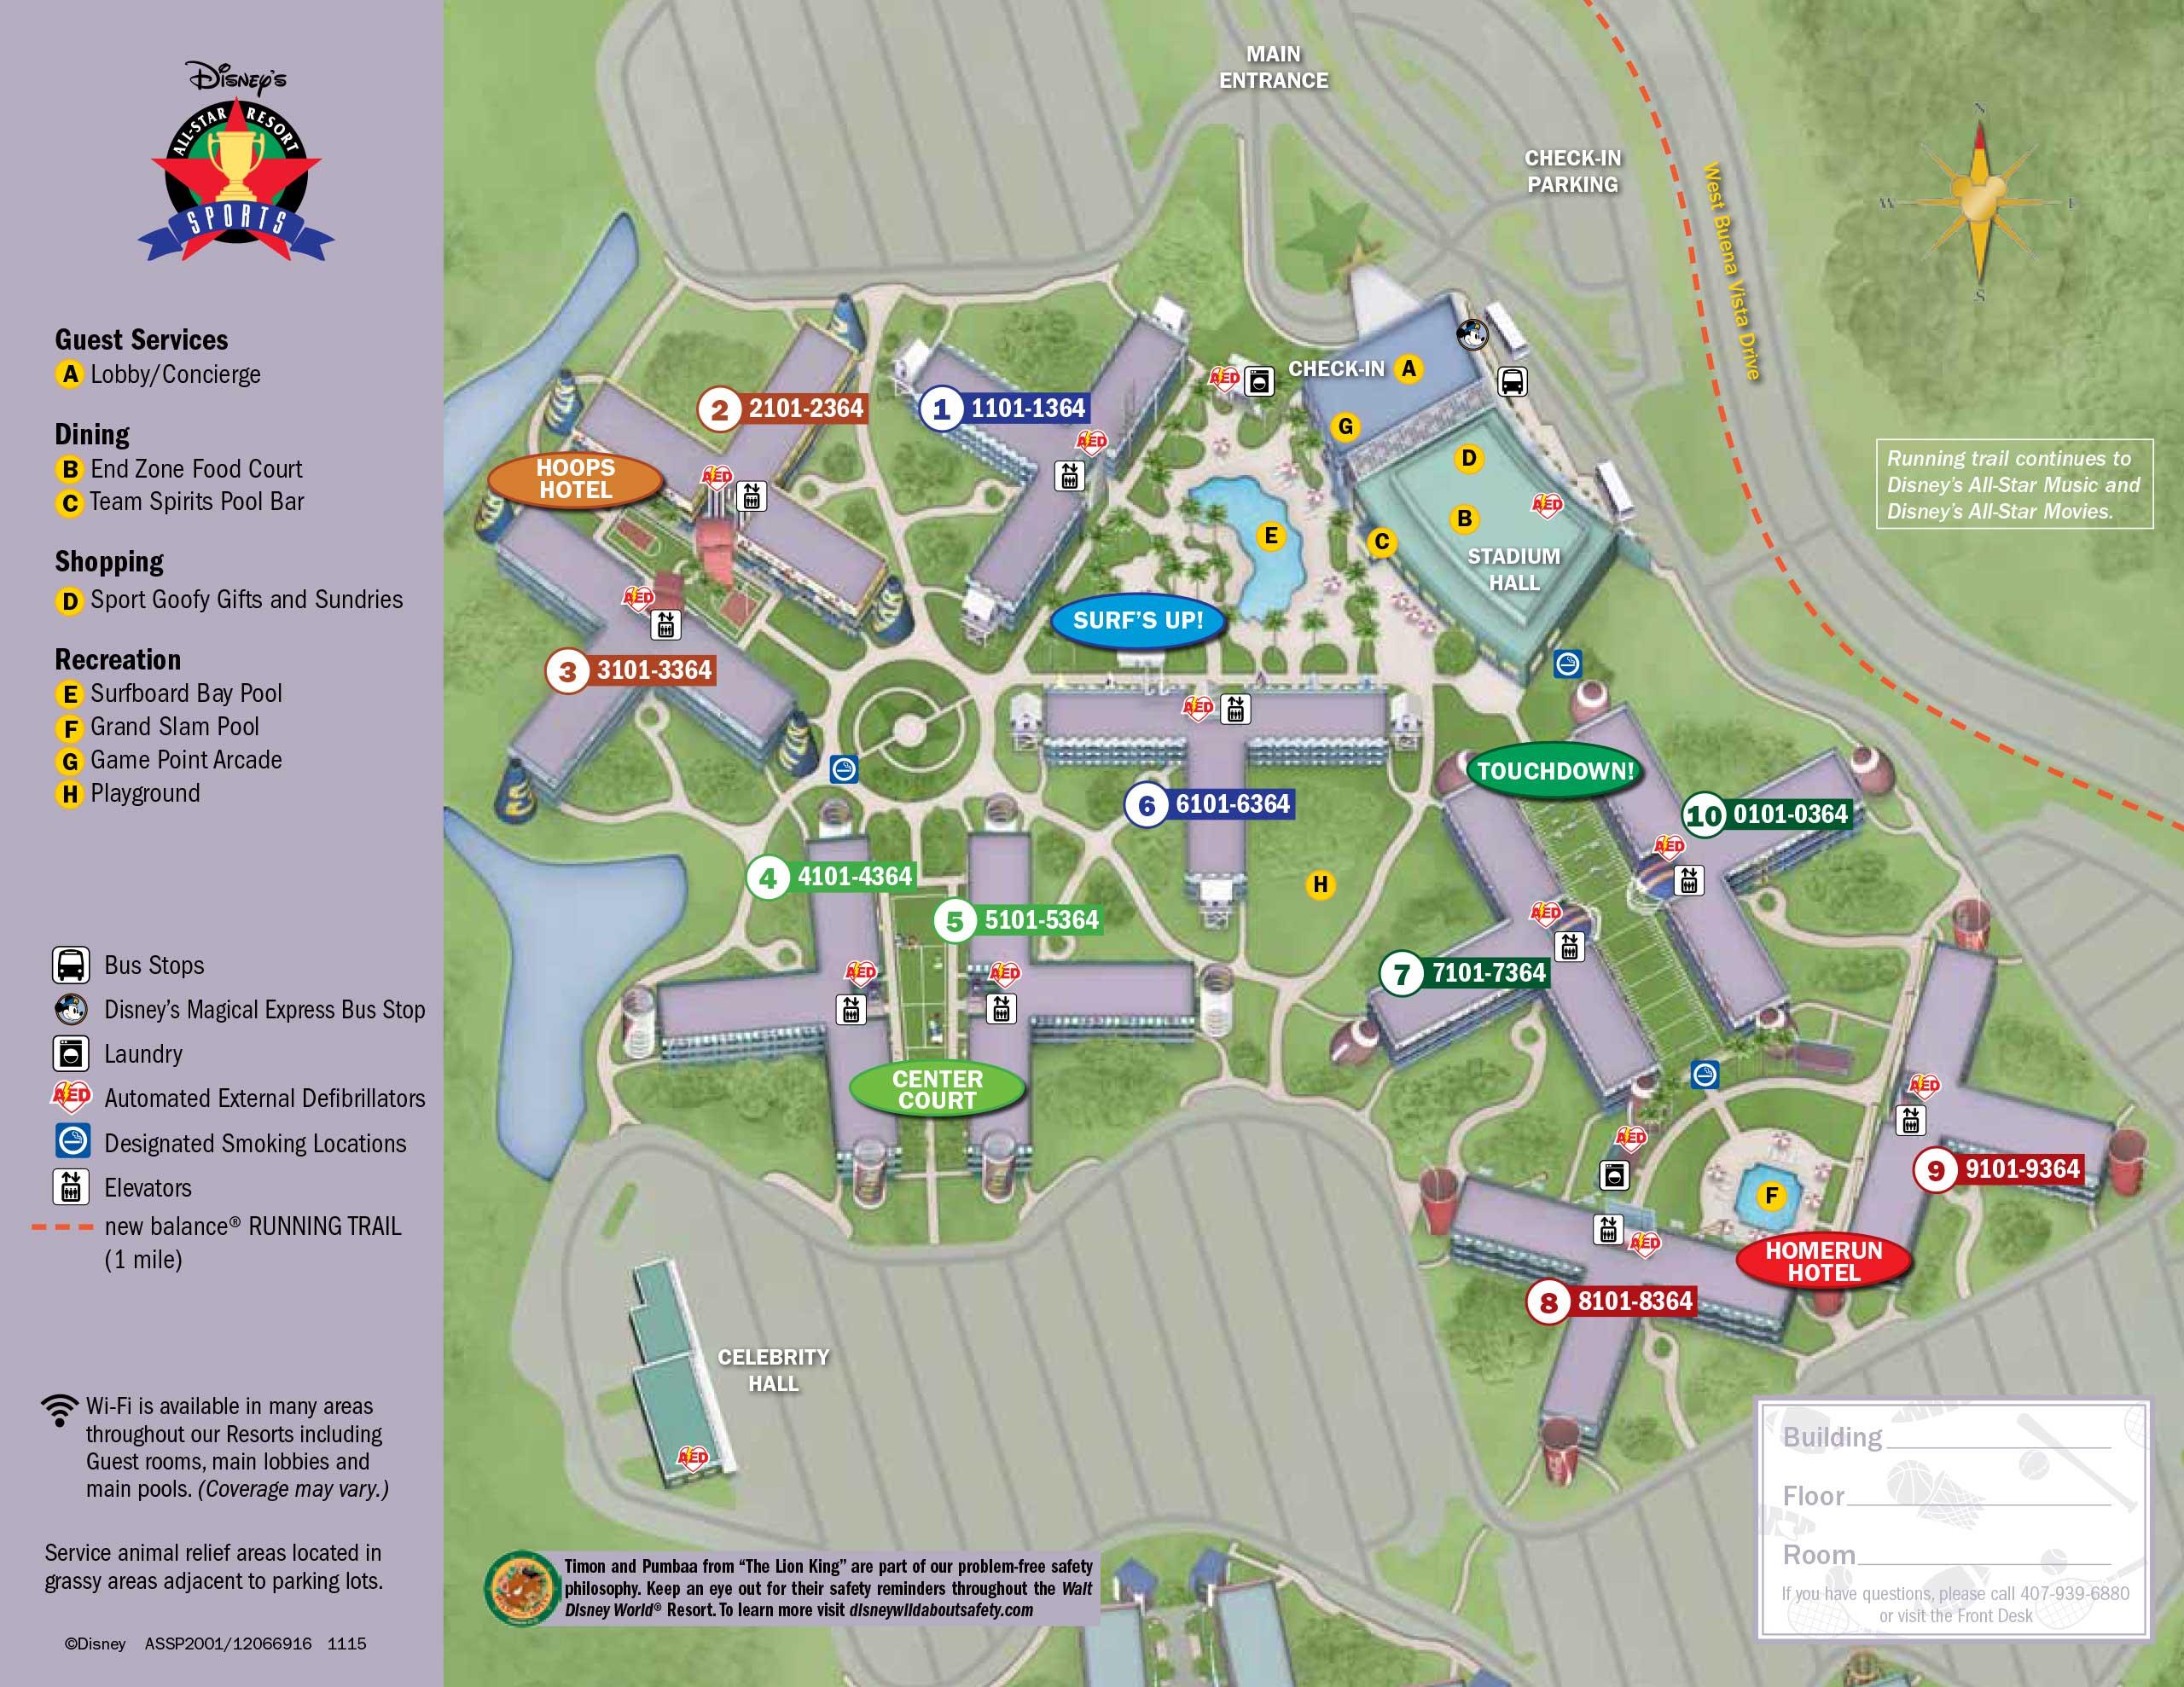 April 2017 Walt Disney World Resort Hotel Maps Photo 4 Of 33: Disney World Hotels Map At Slyspyder.com